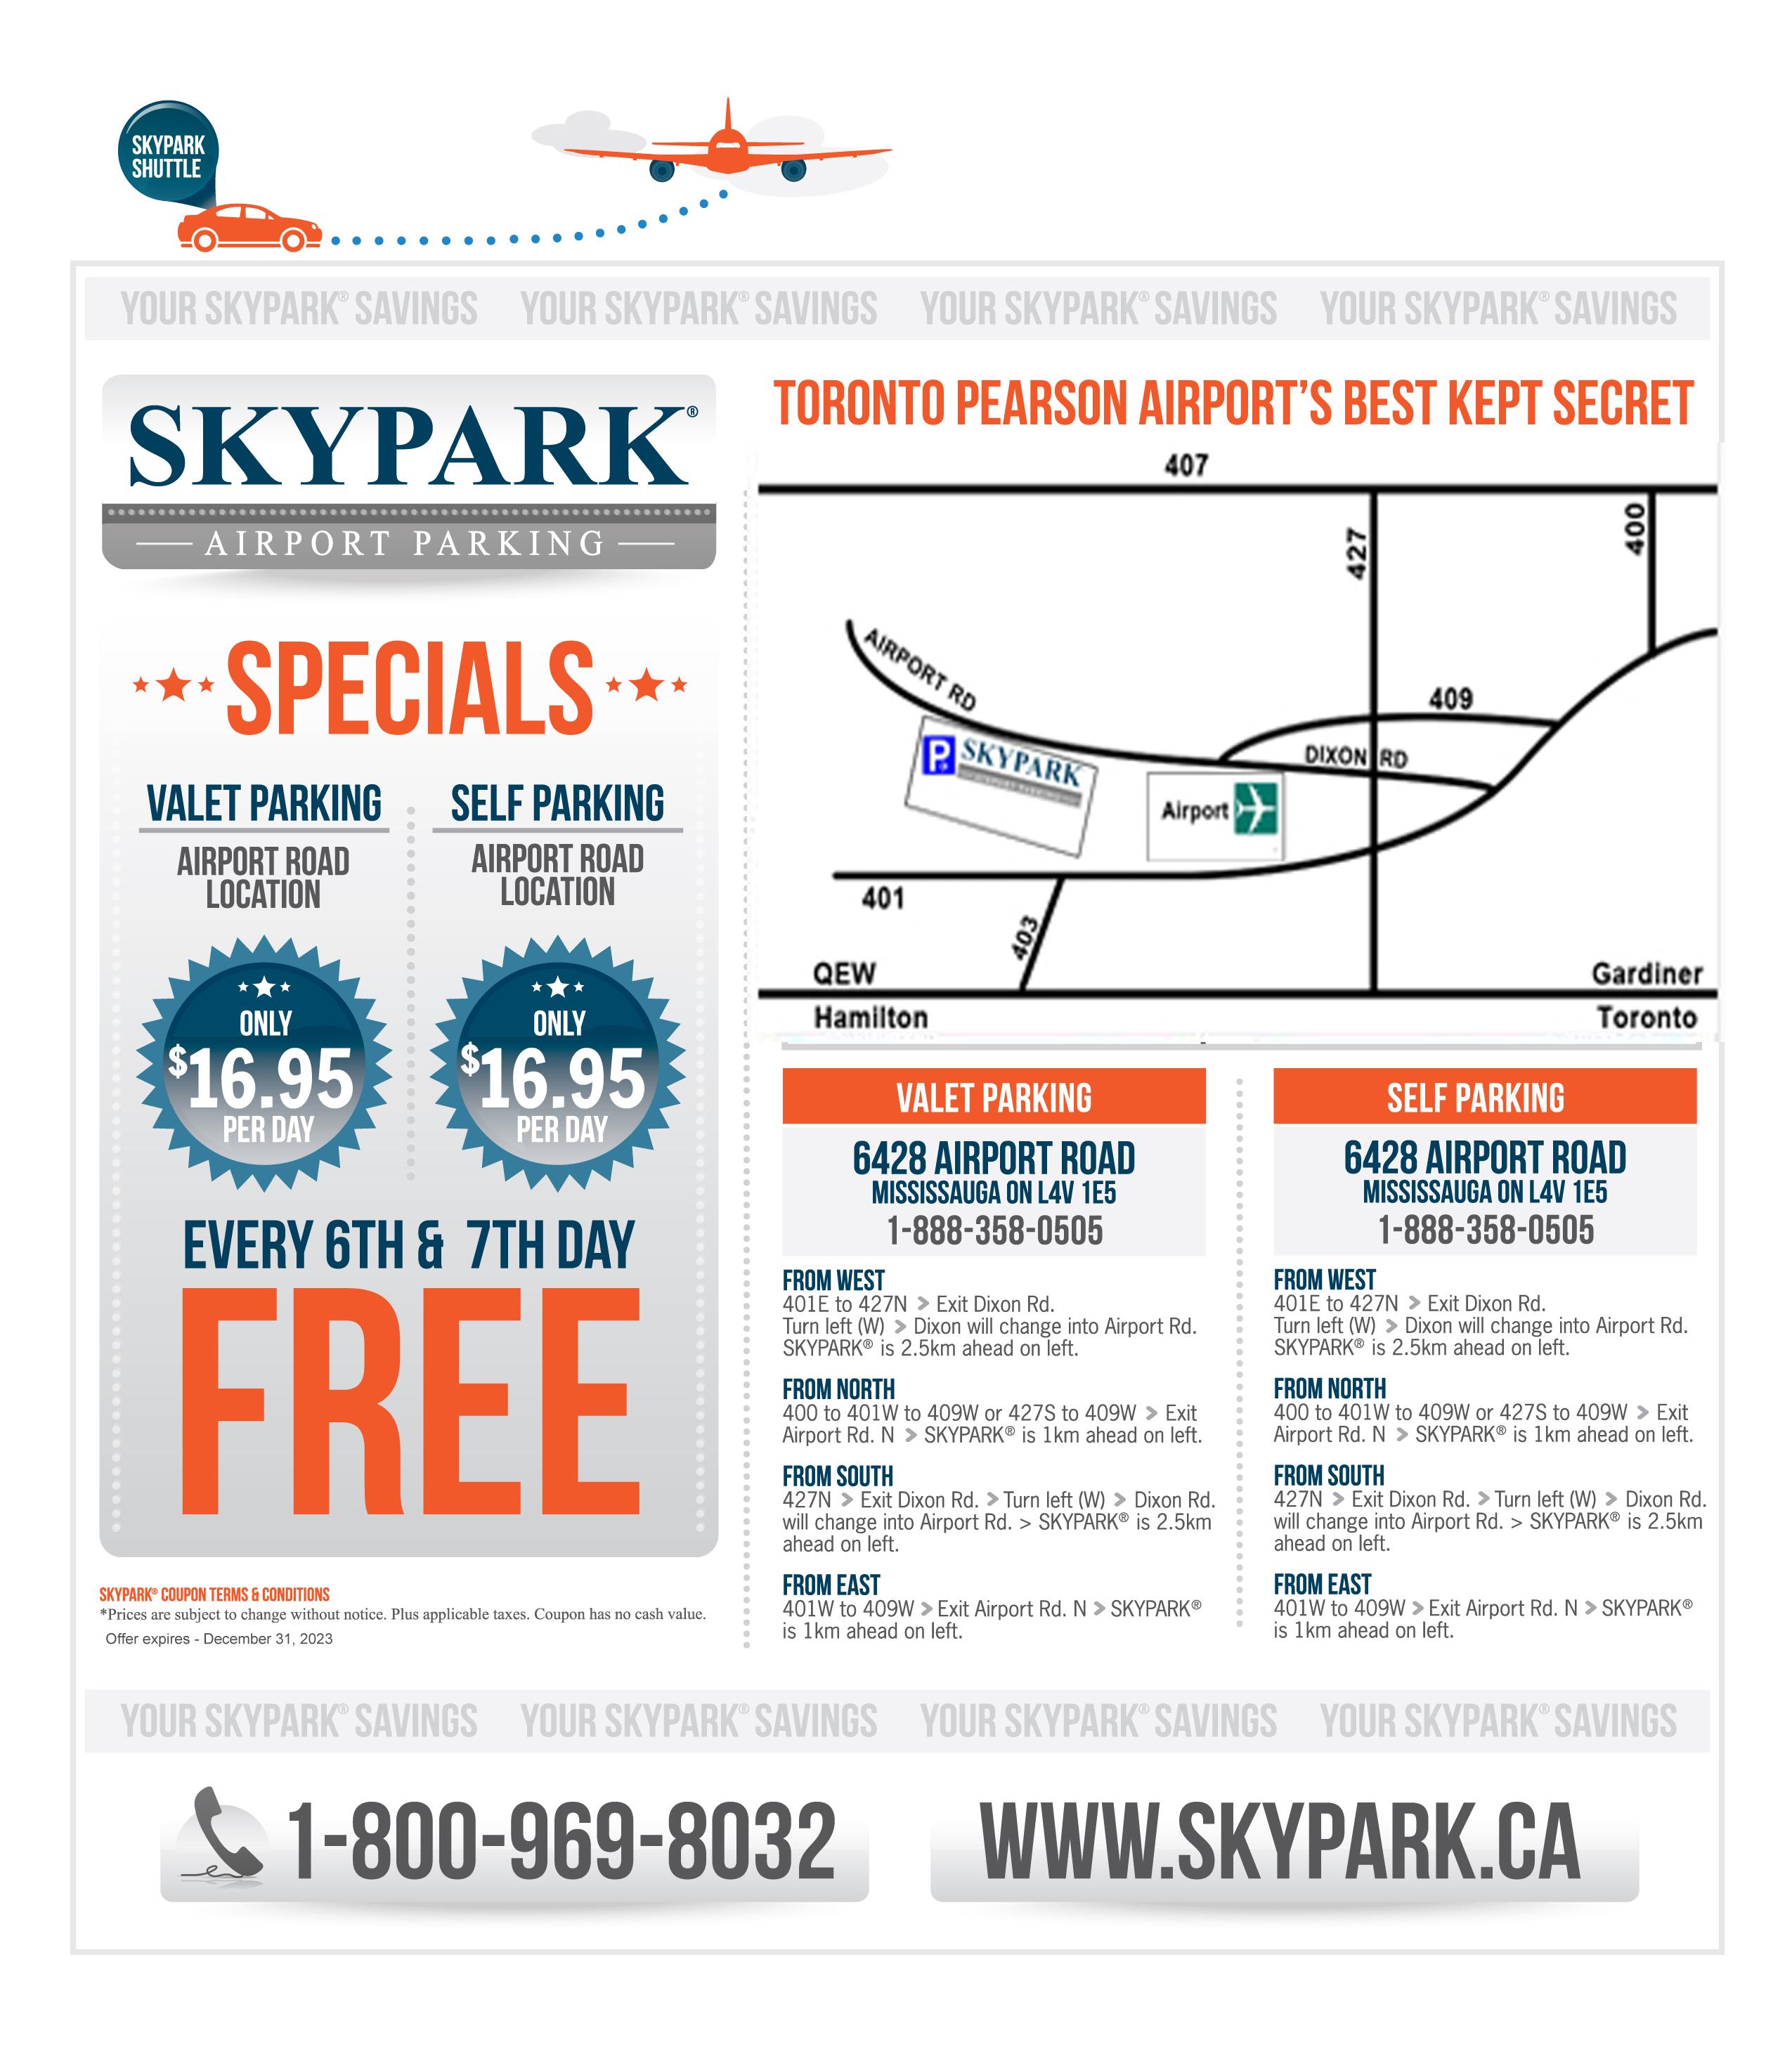 Skypark Airport Parking Toronto Pearson Airport S Best Kept Secret